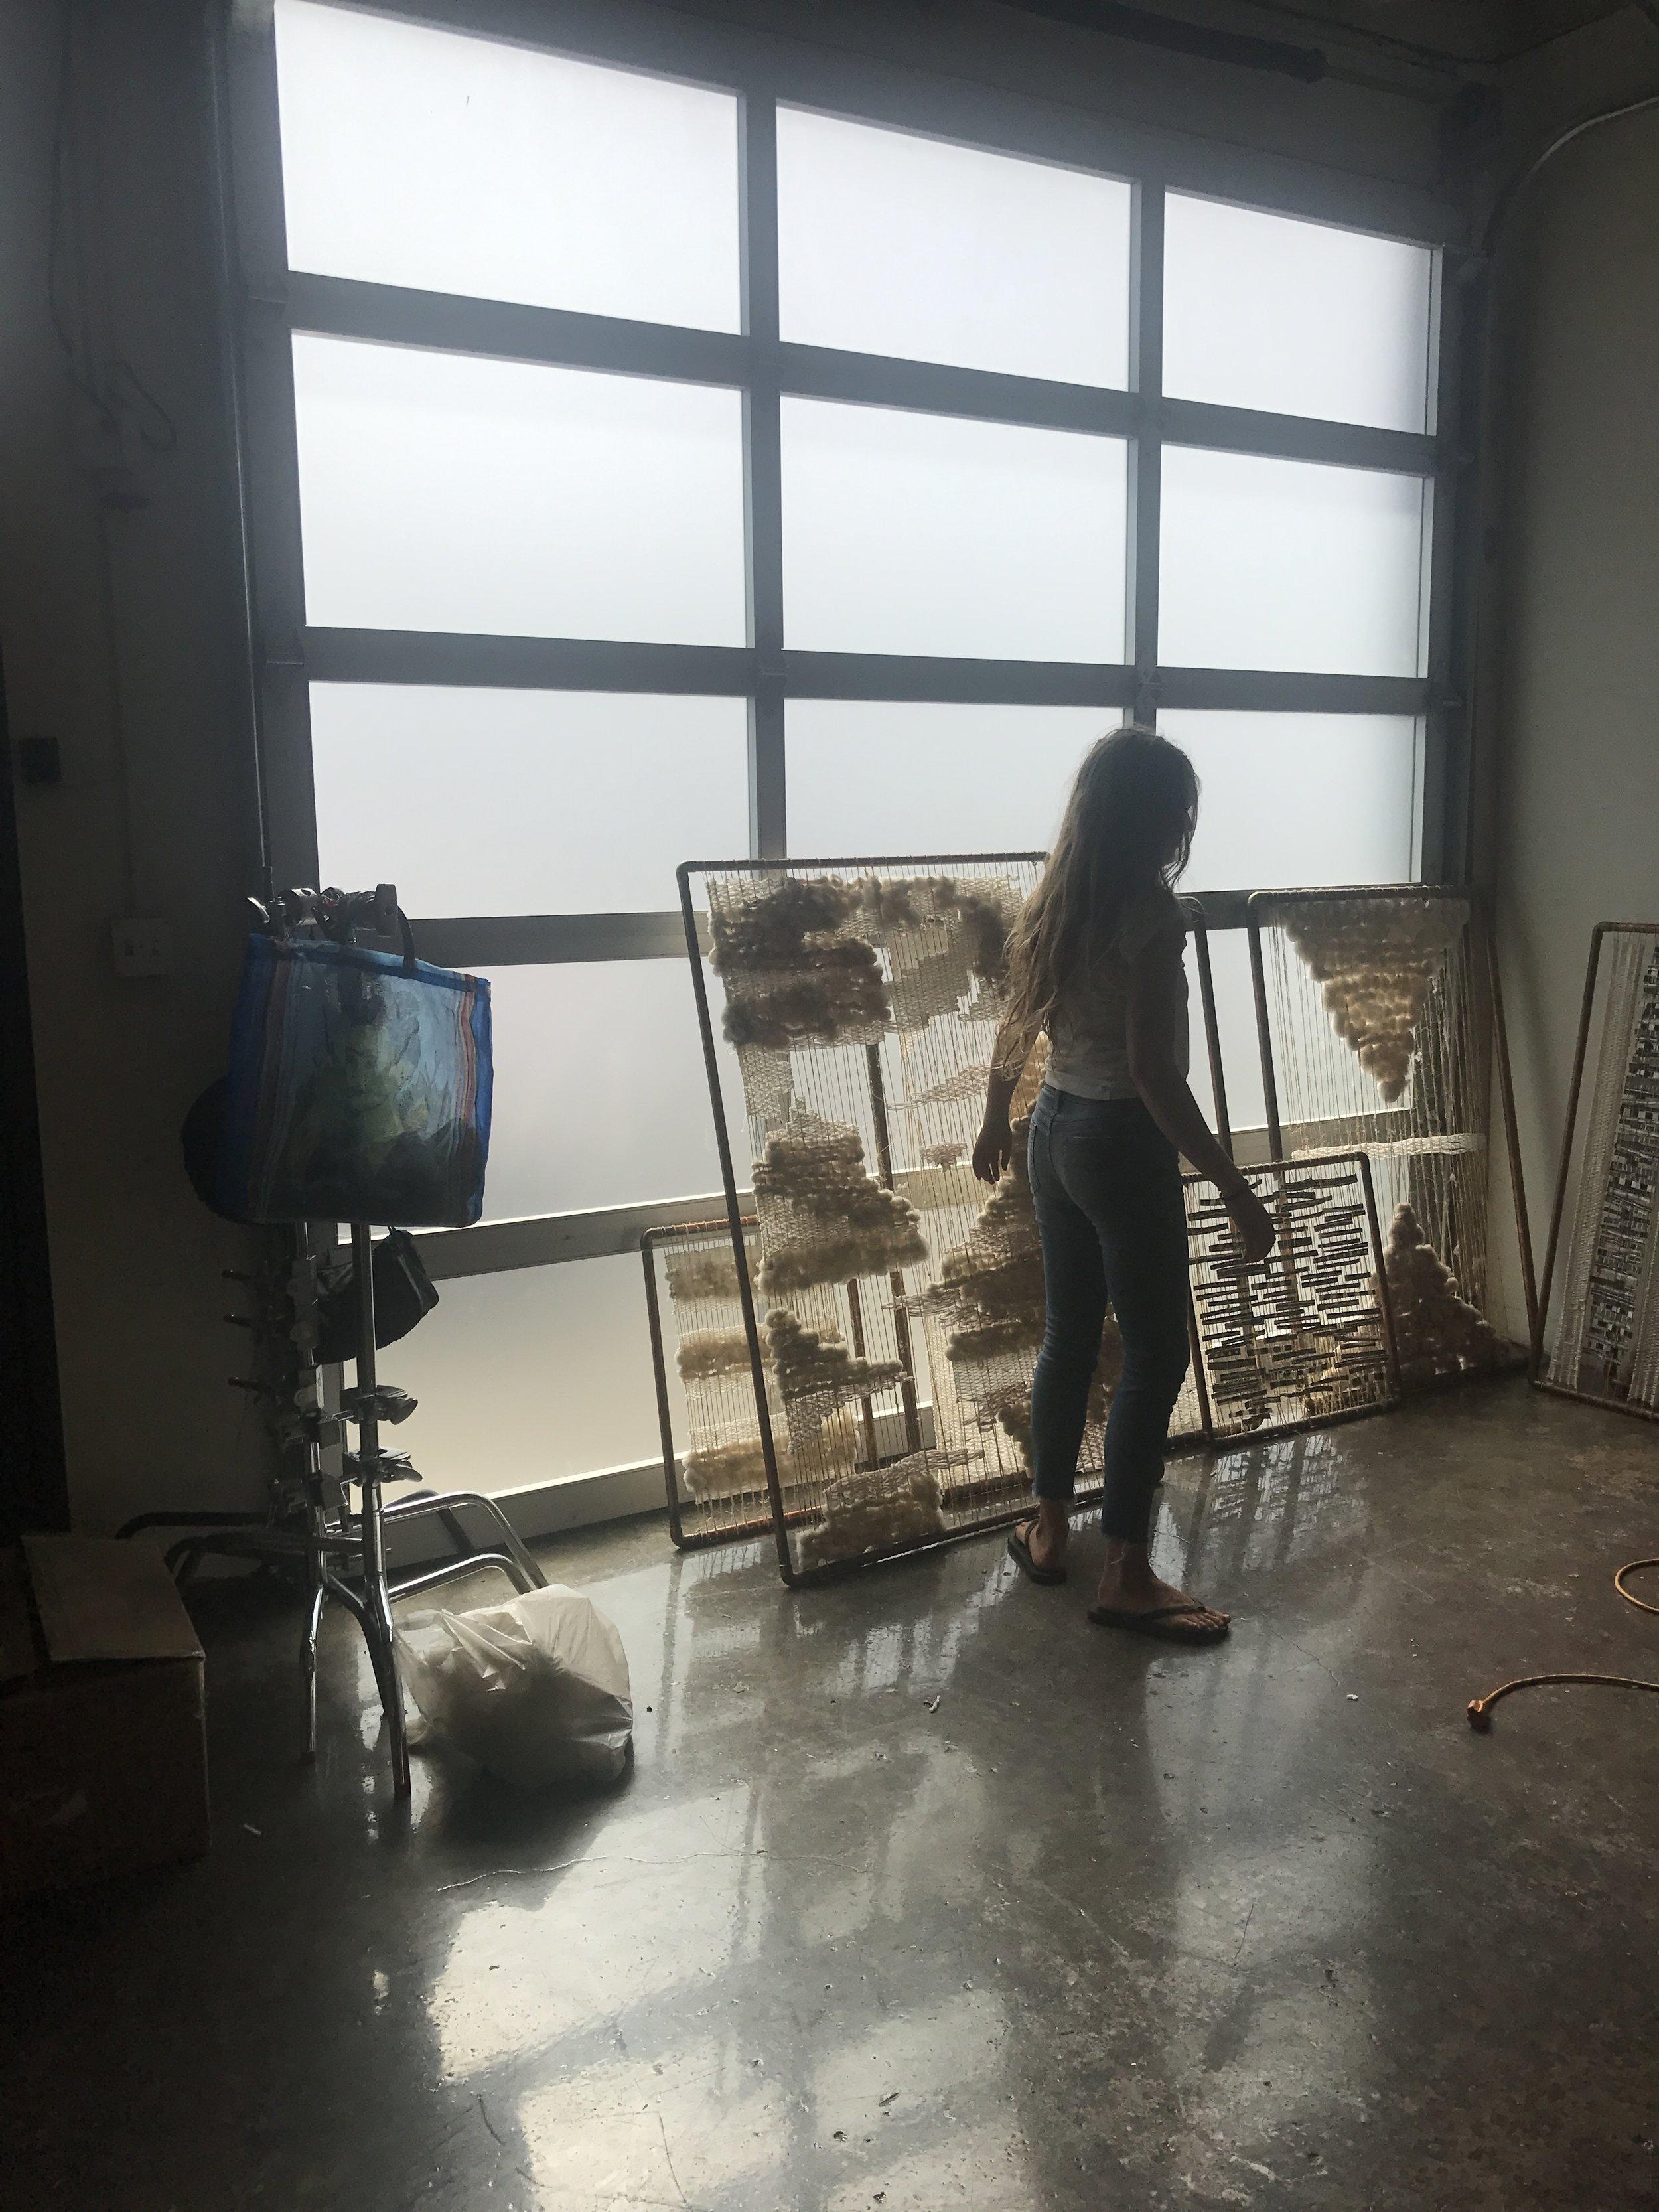 Filming inside the artist's studio.